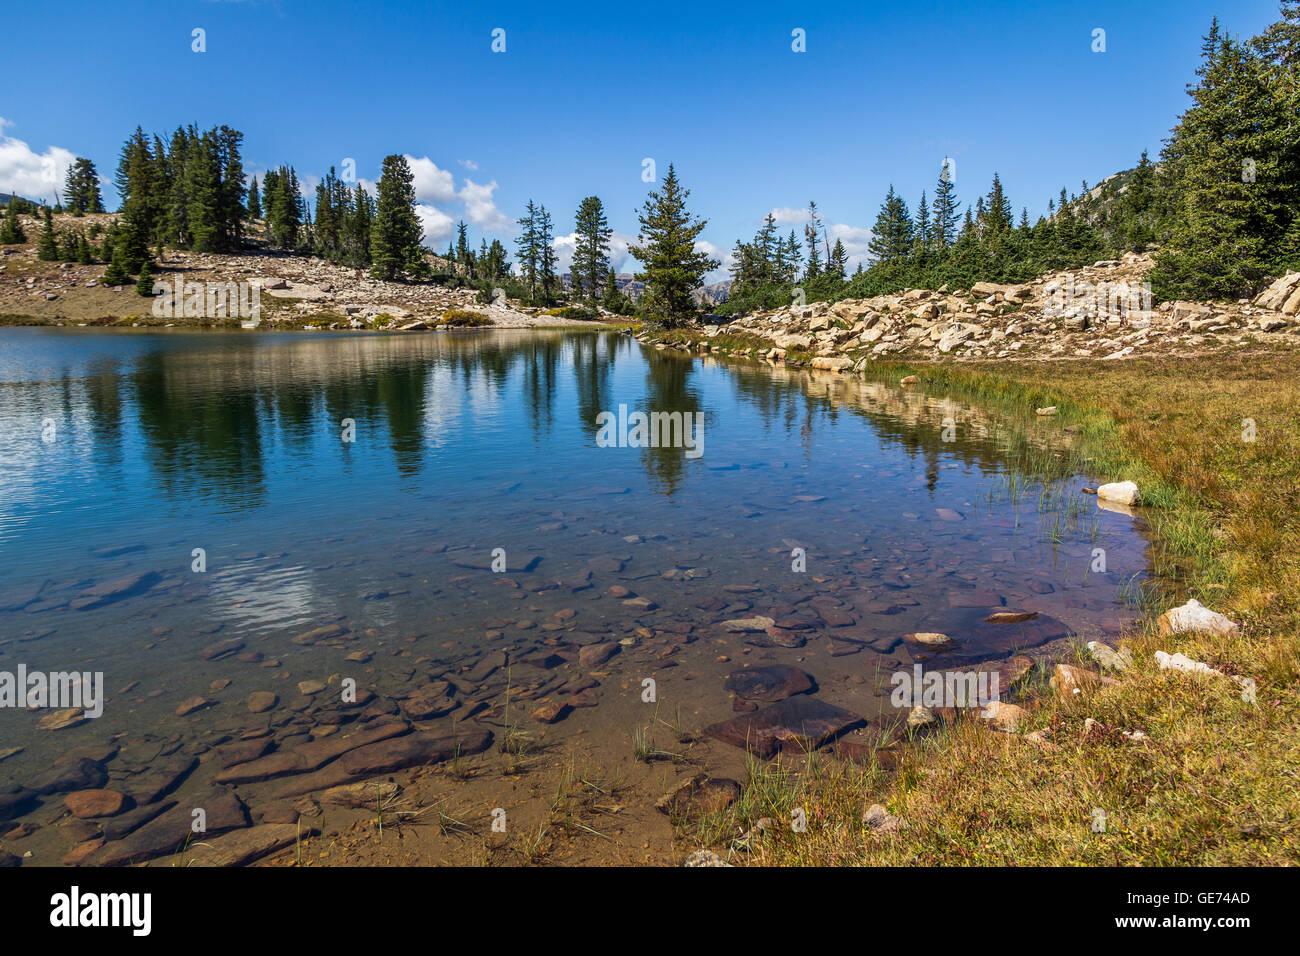 Reflections on  Lofty Lake, Mirror Lake Scenic Byway, Utah - Stock Image